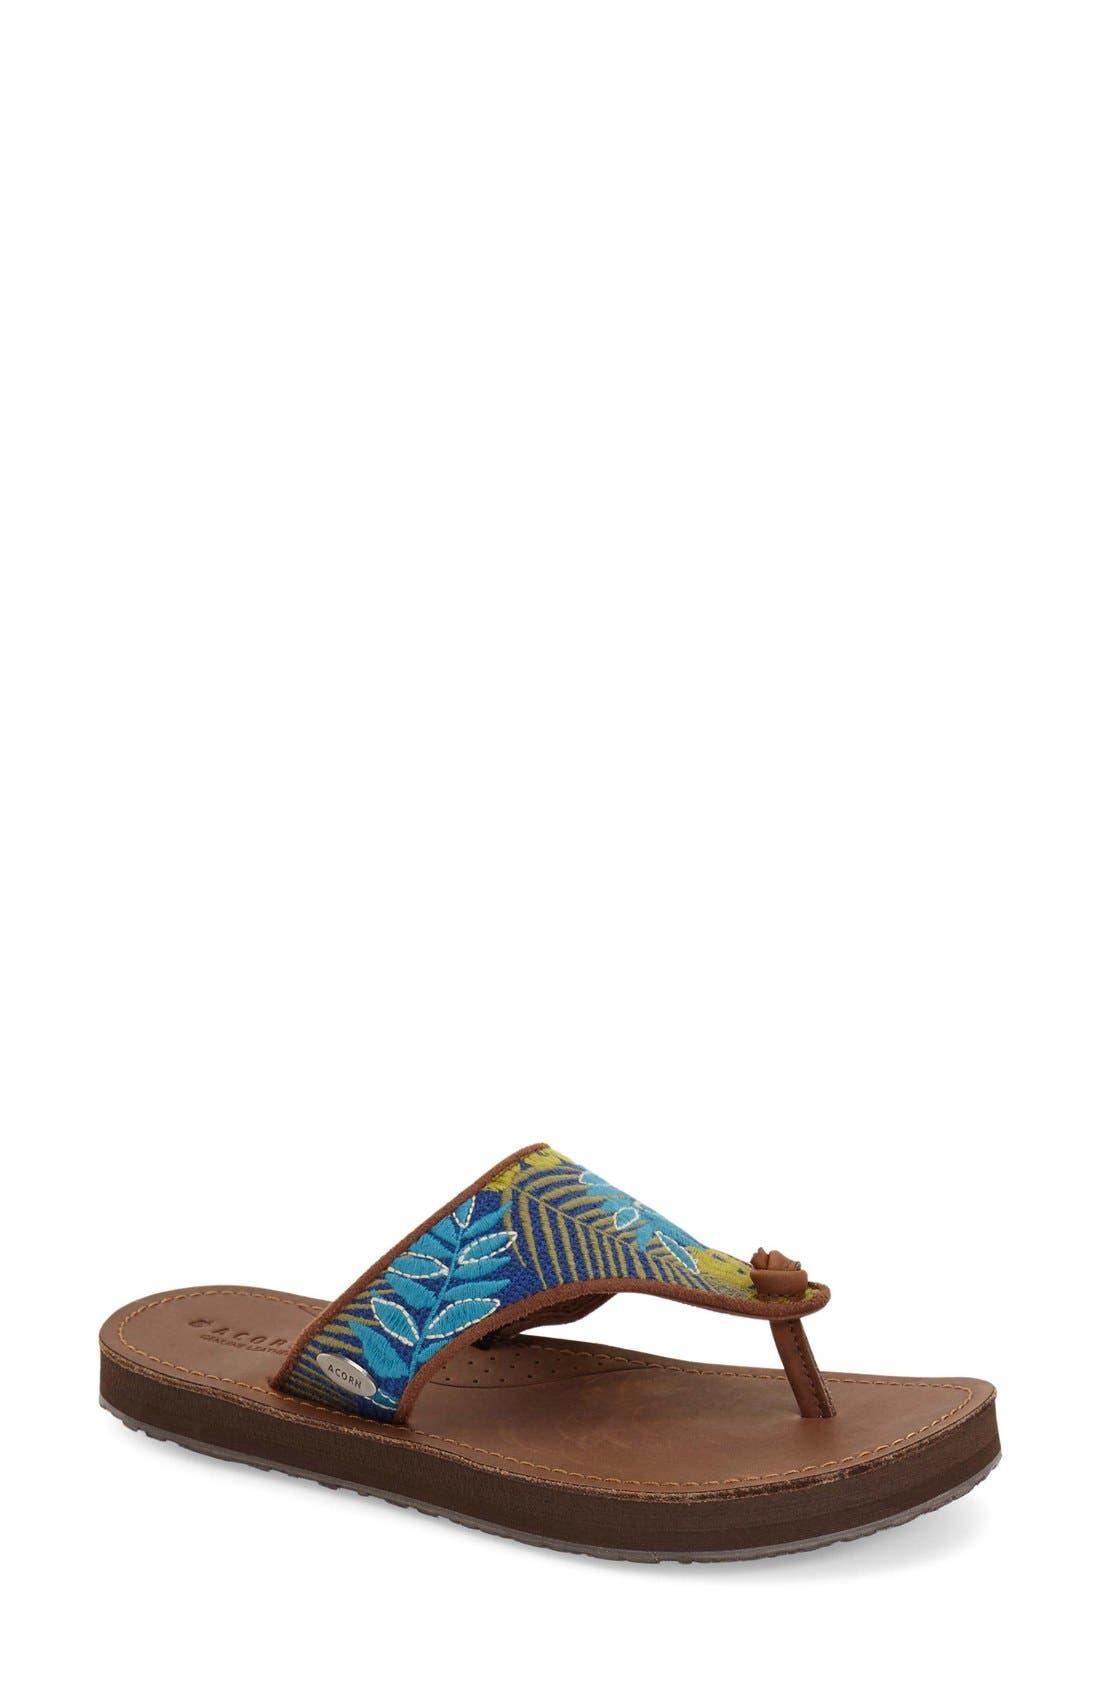 Acorn 'Artwalk' Flip Flop (Women)